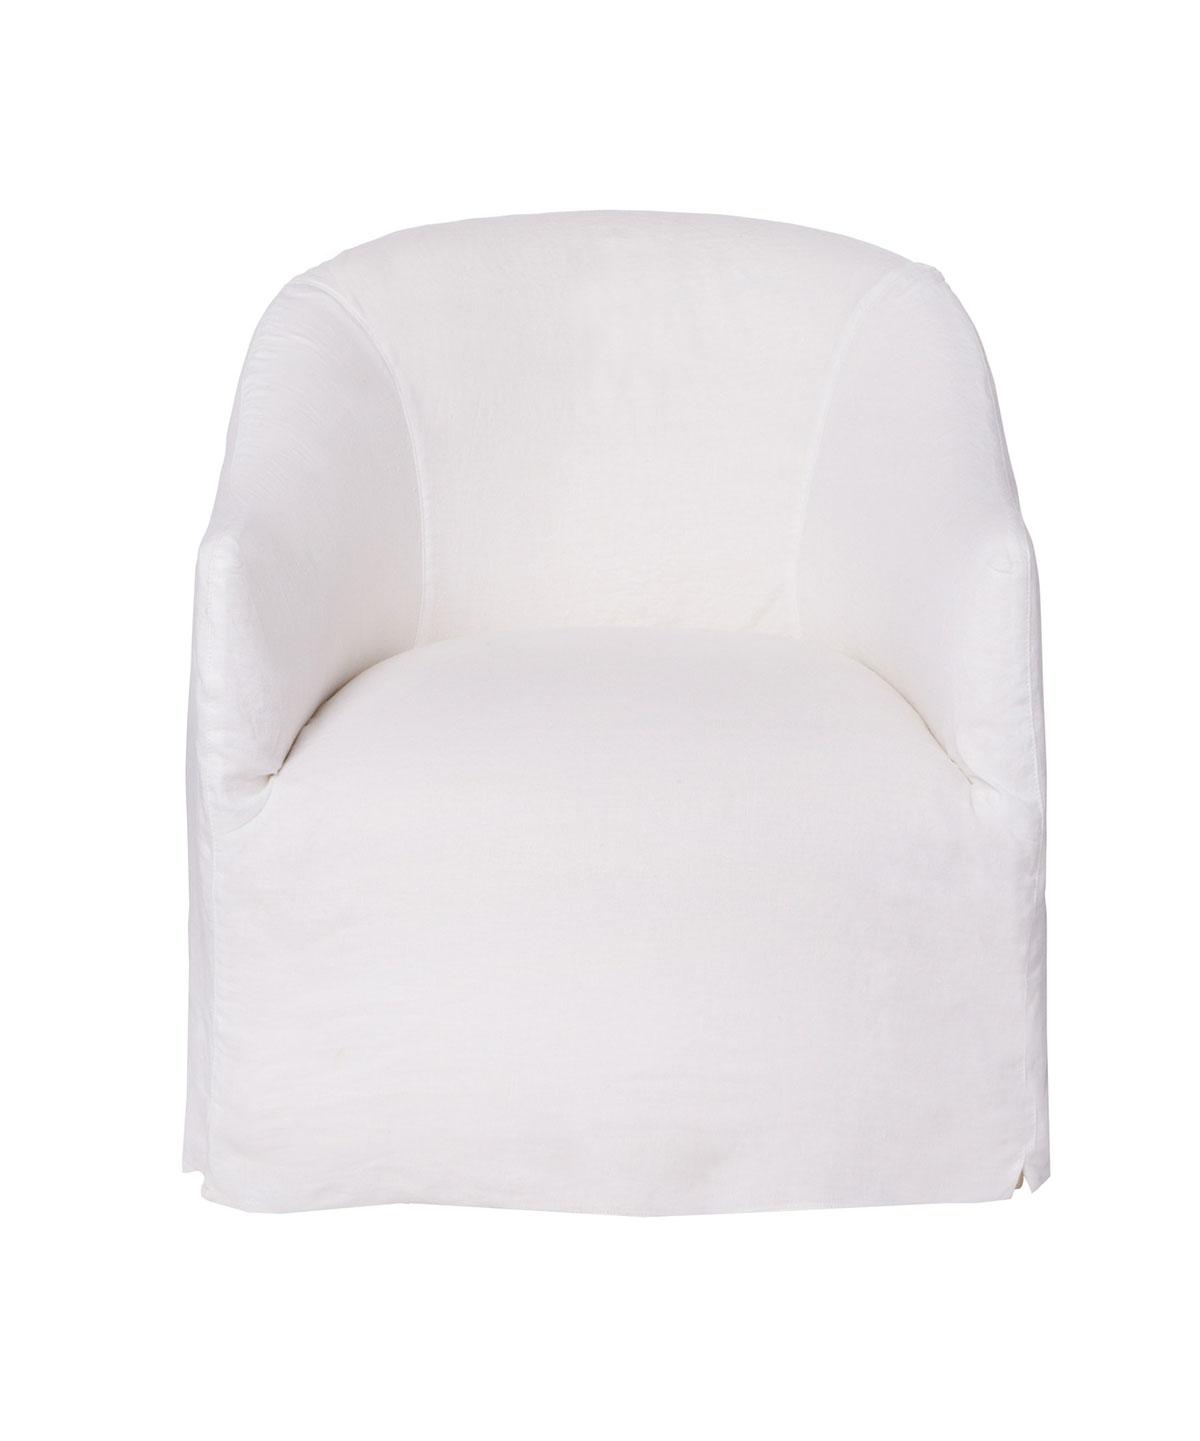 Cali Slipcovered Chair